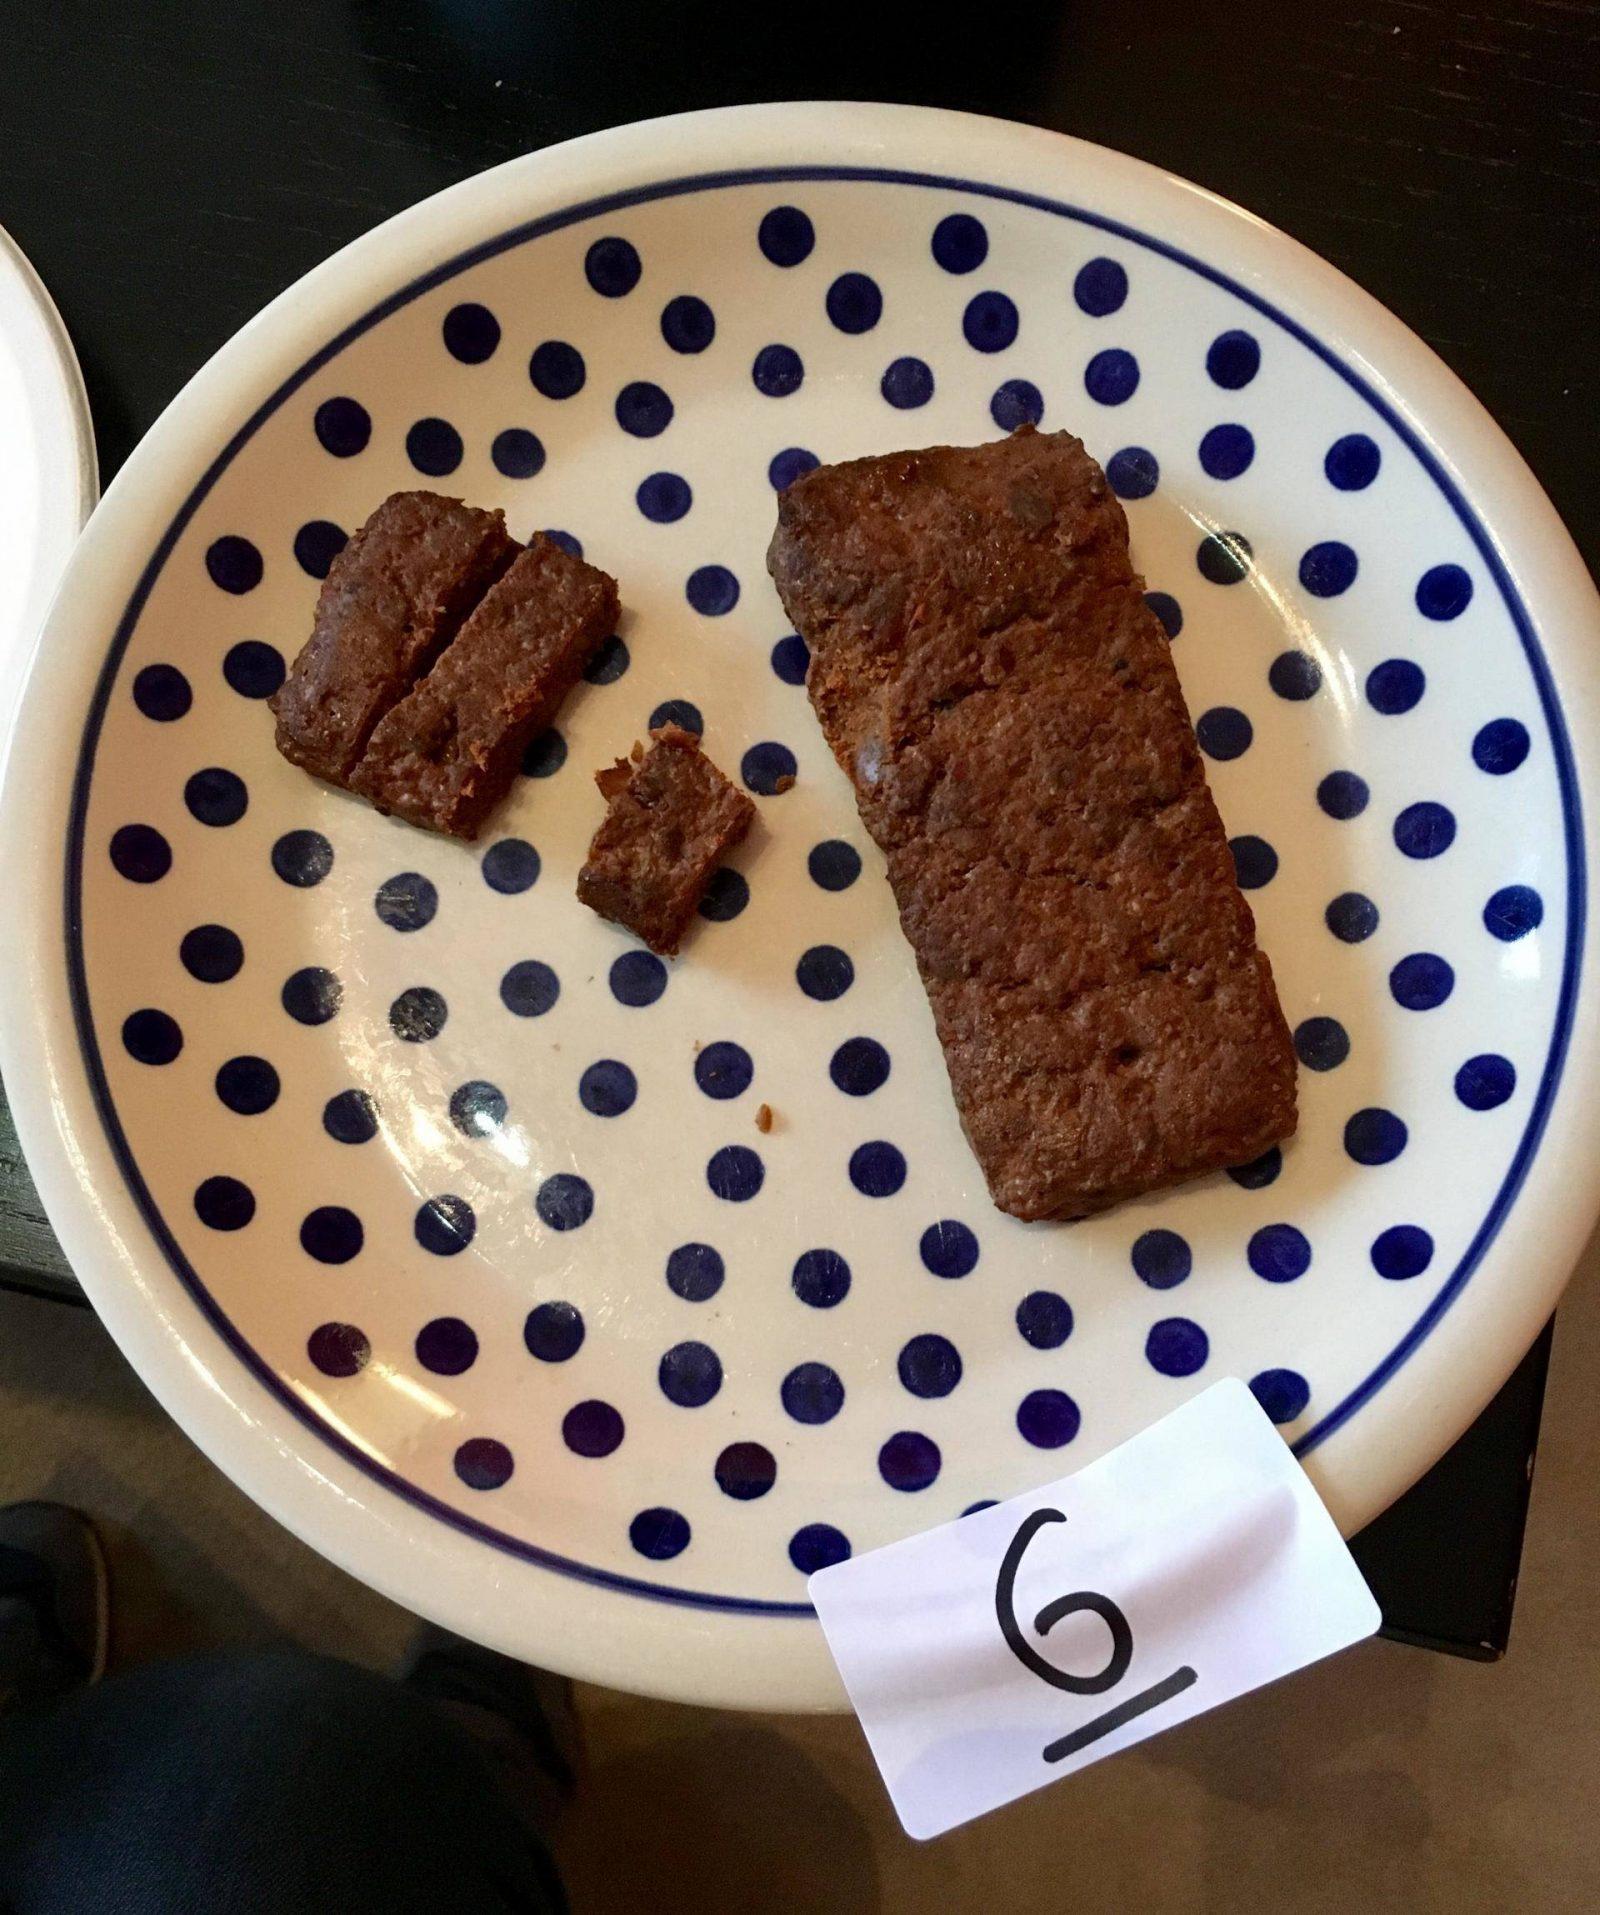 adventures of a gluten free globetrekker 2017 Free From Food Awards Gluten Free Products Gluten Free Travel UK